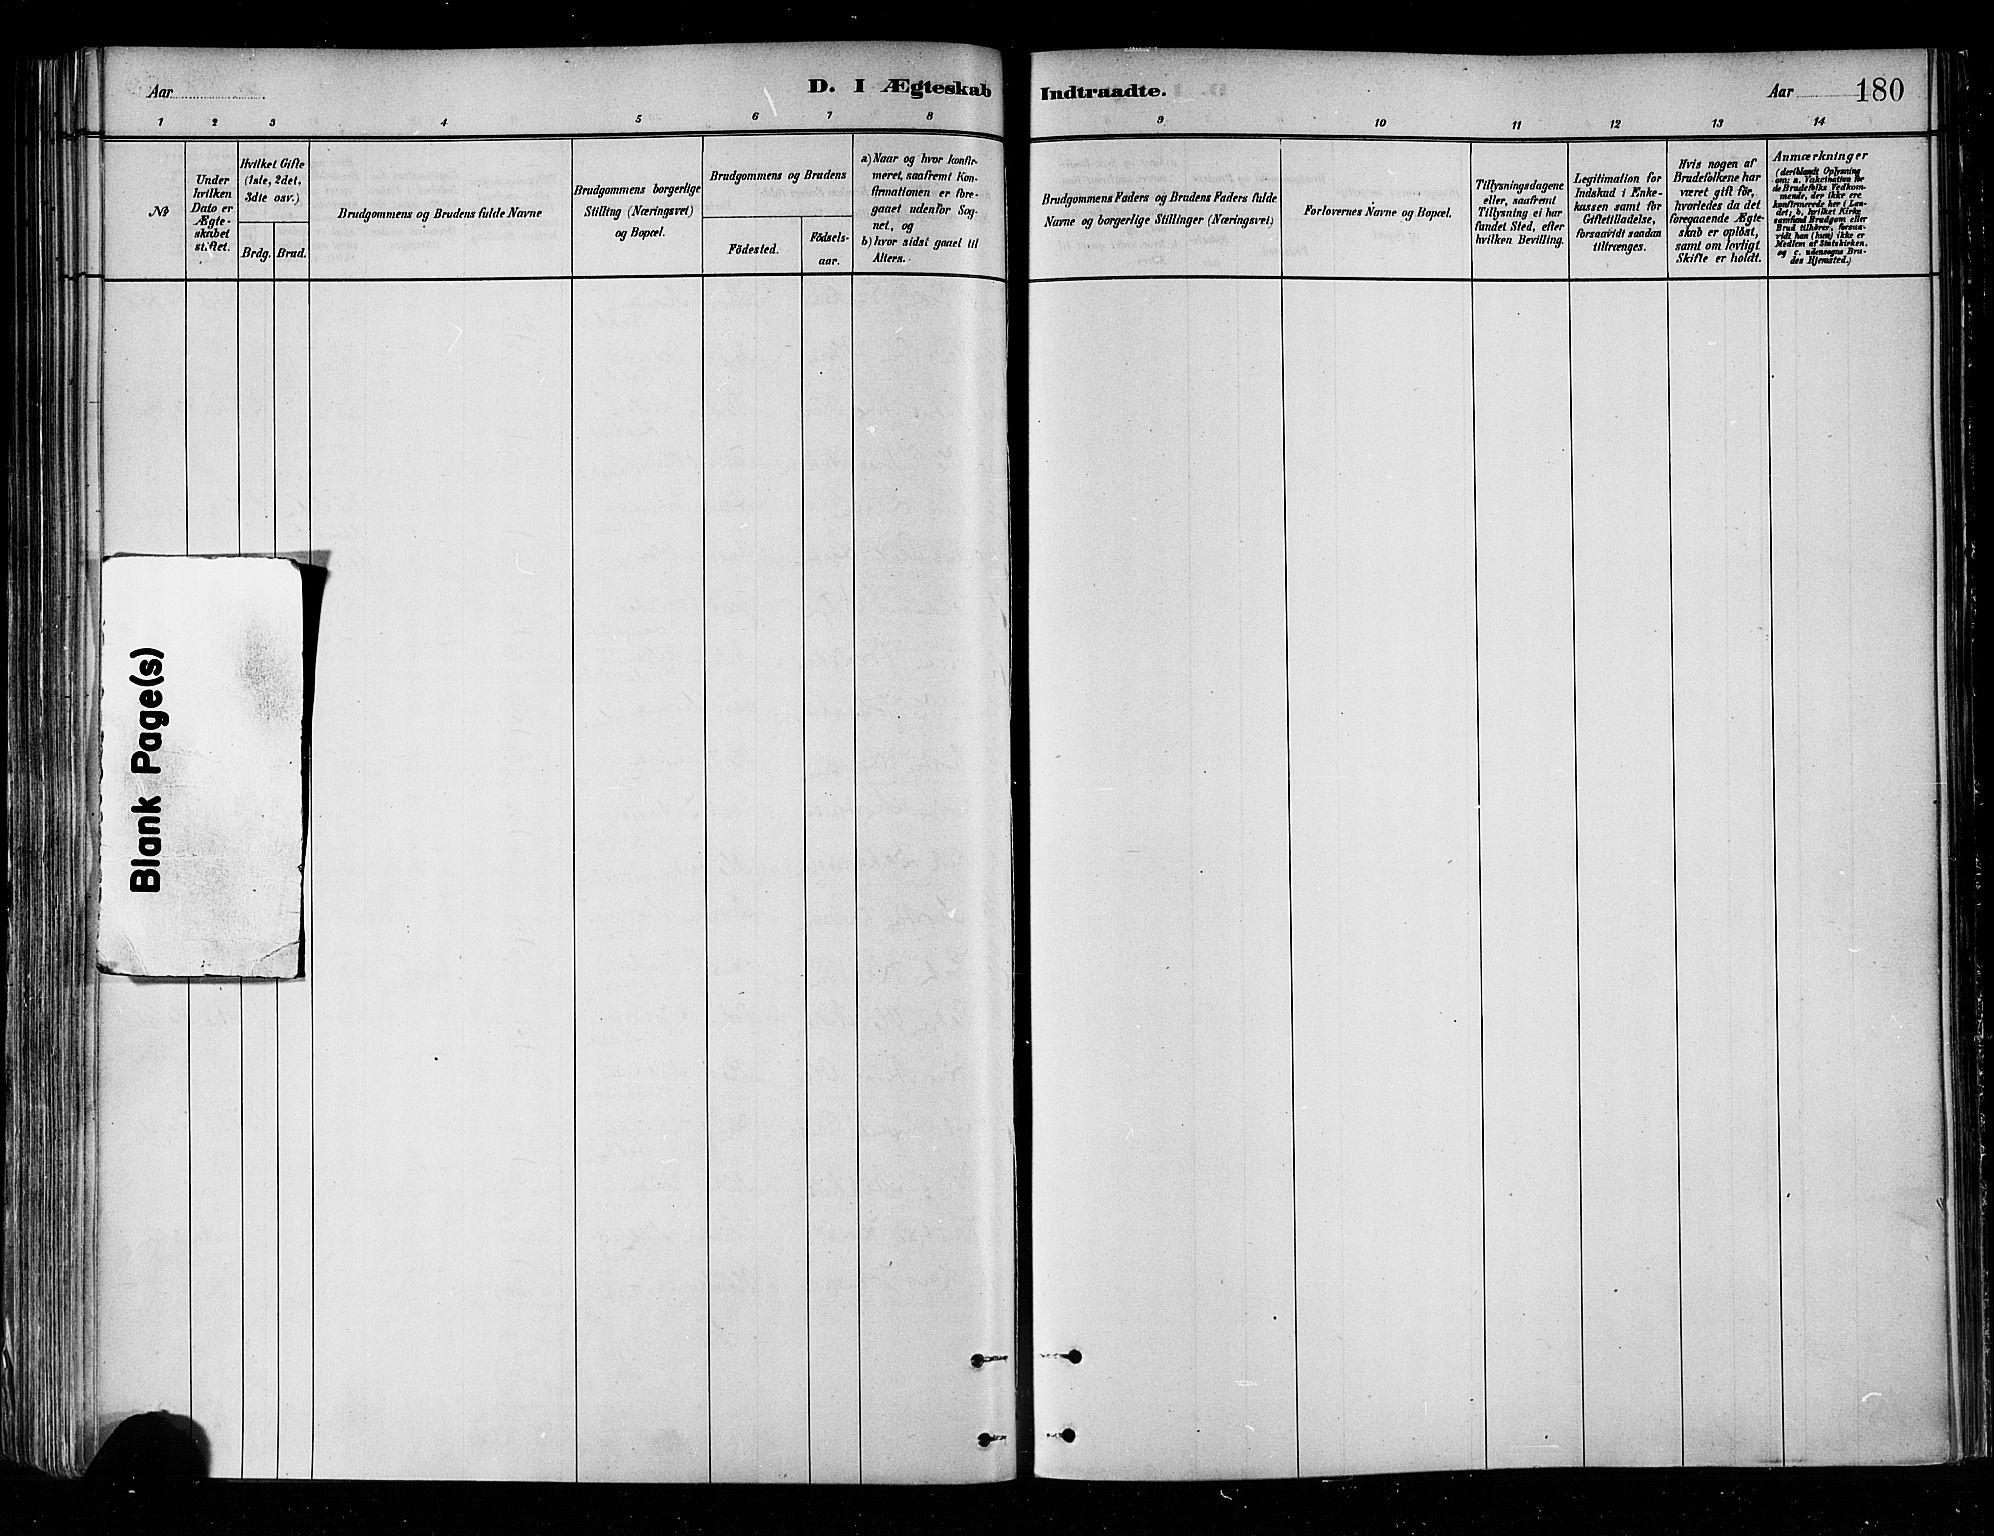 SATØ, Skjervøy sokneprestkontor, H/Ha/Haa/L0010kirke: Ministerialbok nr. 10, 1887-1898, s. 180